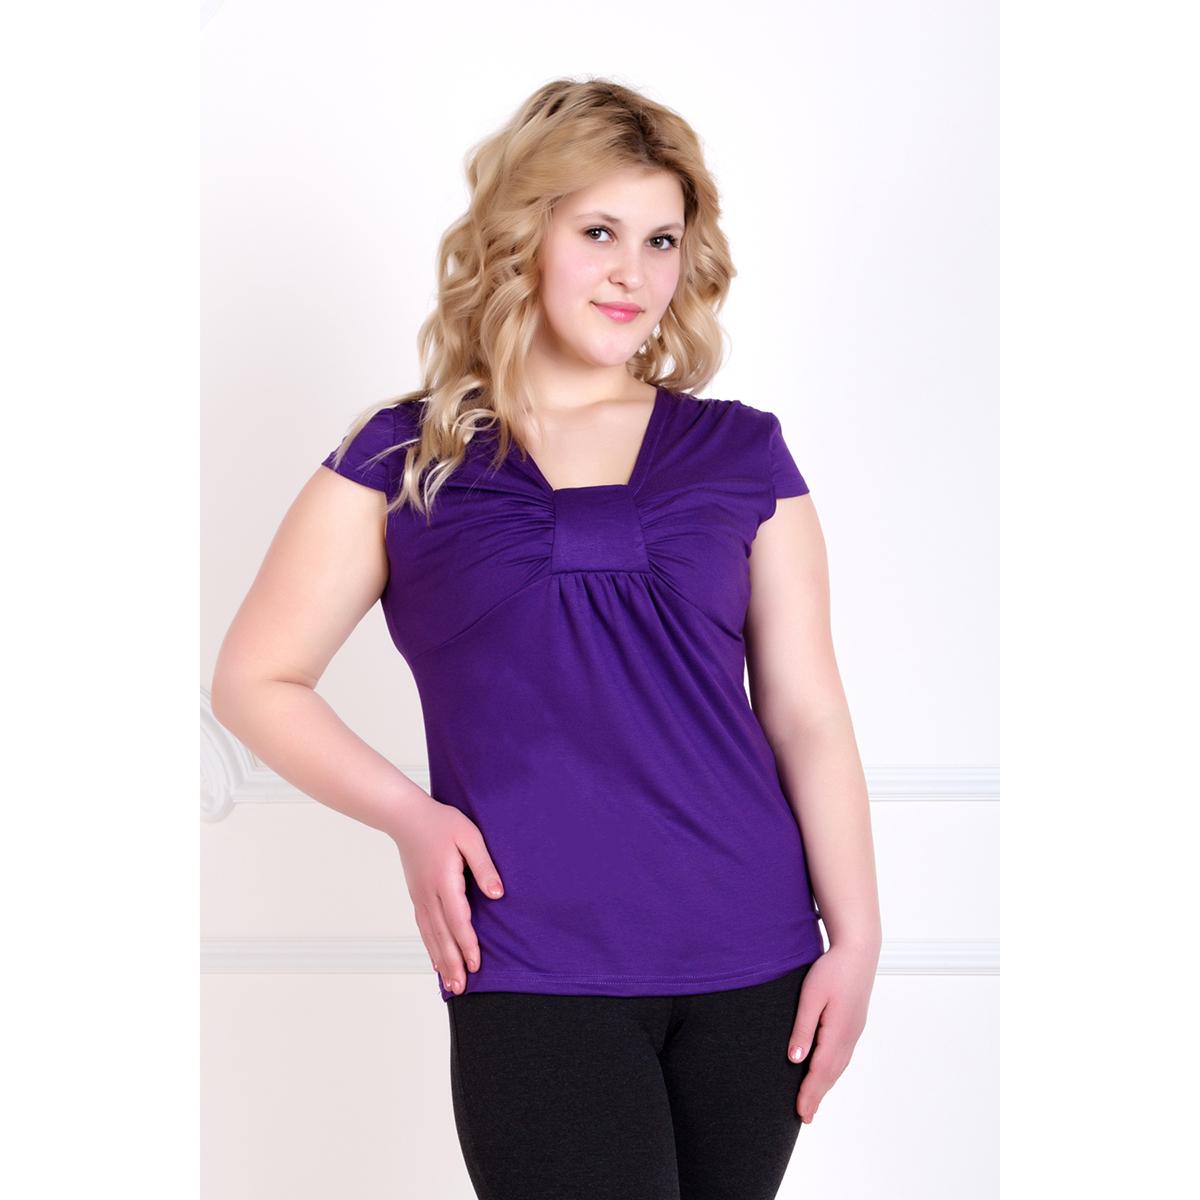 Женская блуза Романтика Фиолетовый, размер 54Блузы<br>Обхват груди: 108 см <br>Обхват талии: 88 см <br>Обхват бедер: 116 см <br>Рост: 167 см<br><br>Тип: Жен. блуза<br>Размер: 54<br>Материал: Вискоза